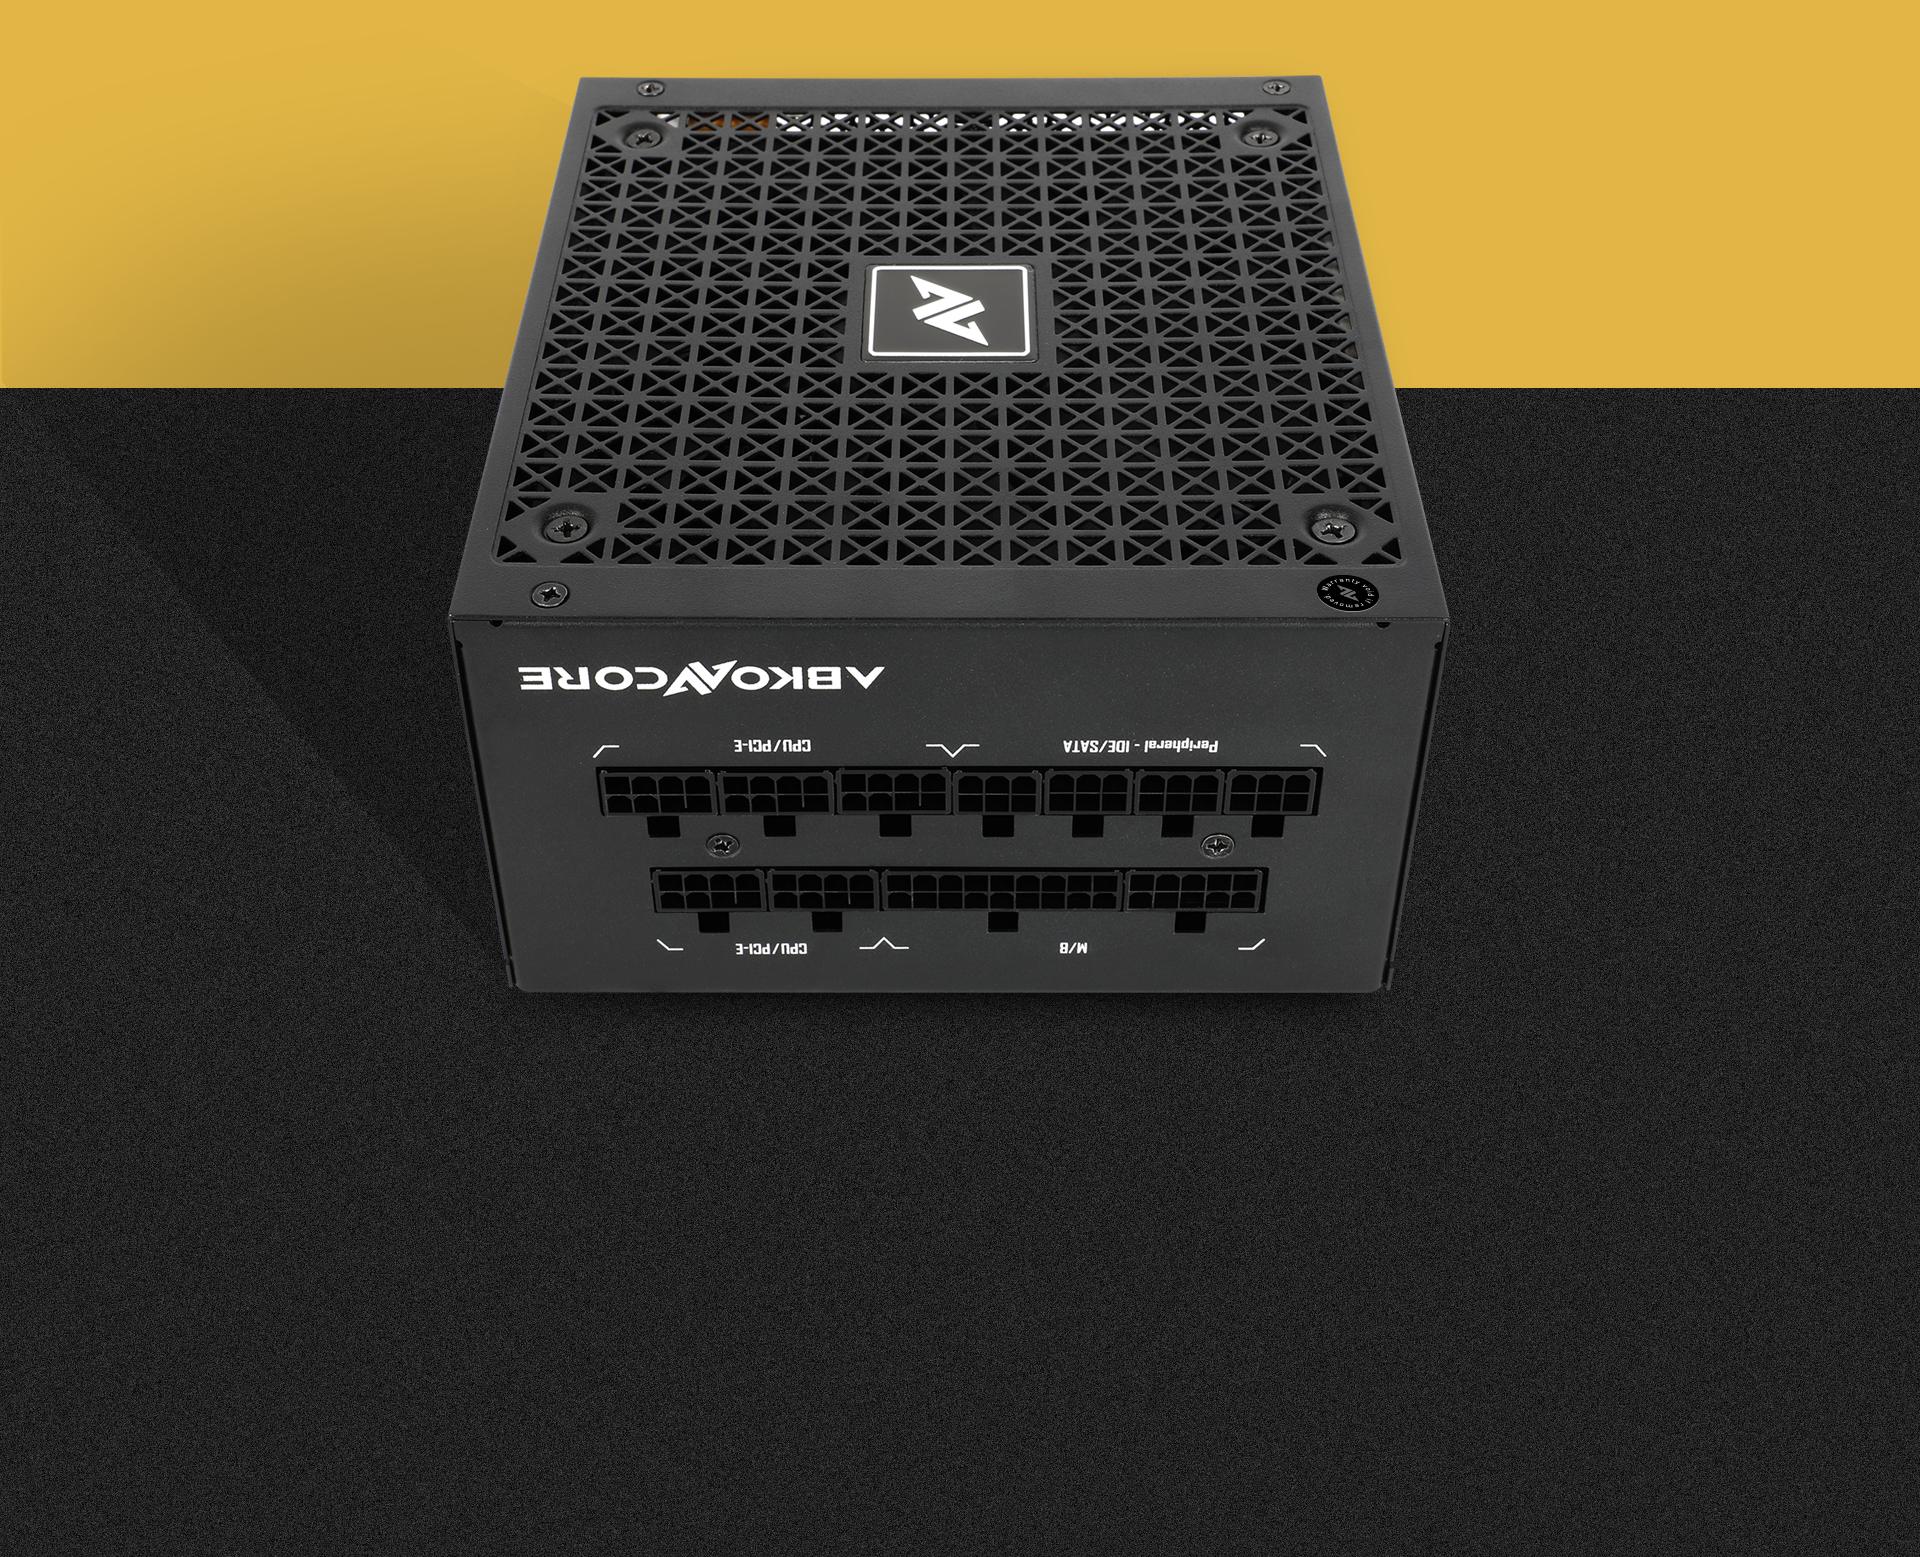 Fuente de alimentación TN850W Gold Modular imagen descripción gestión de cables modular